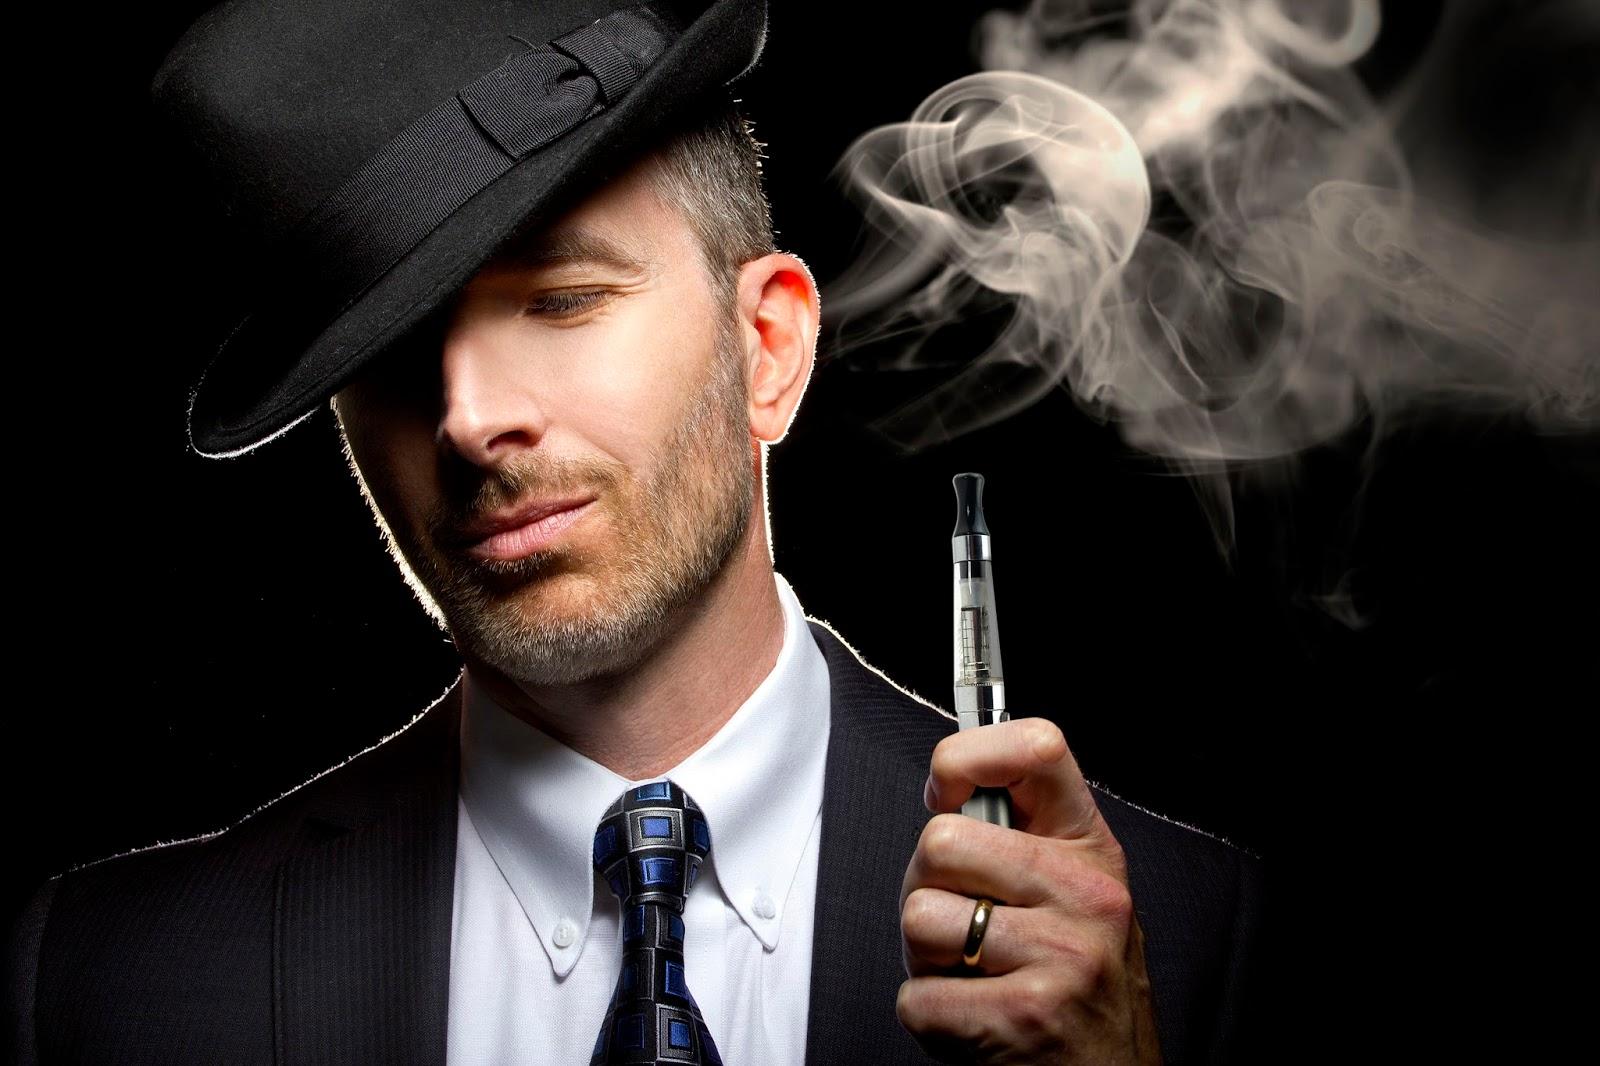 Is Nicotine Vaping & Alcohol Good? – FAQ